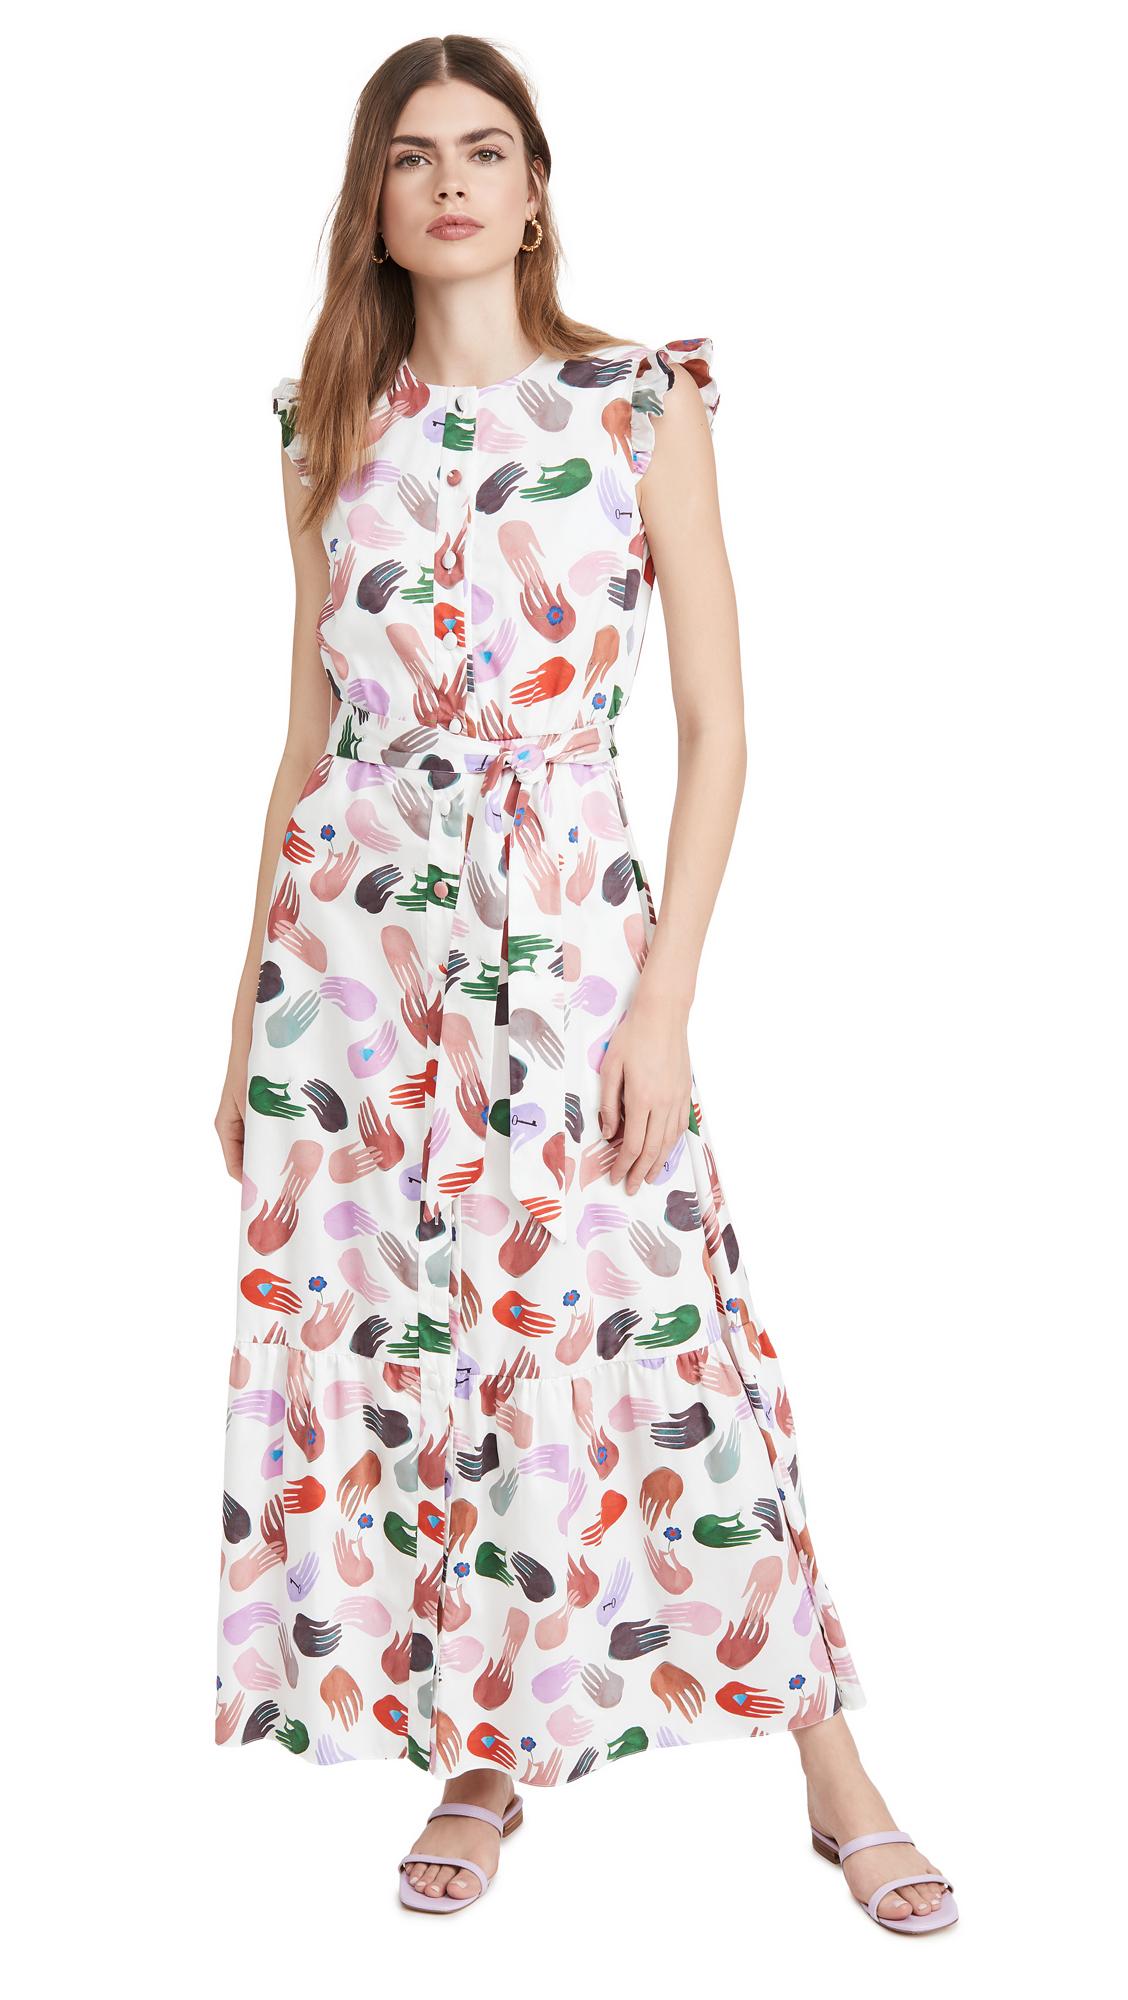 Borgo de Nor Gabrielle Poplin Magic Hand Dress - 40% Off Sale